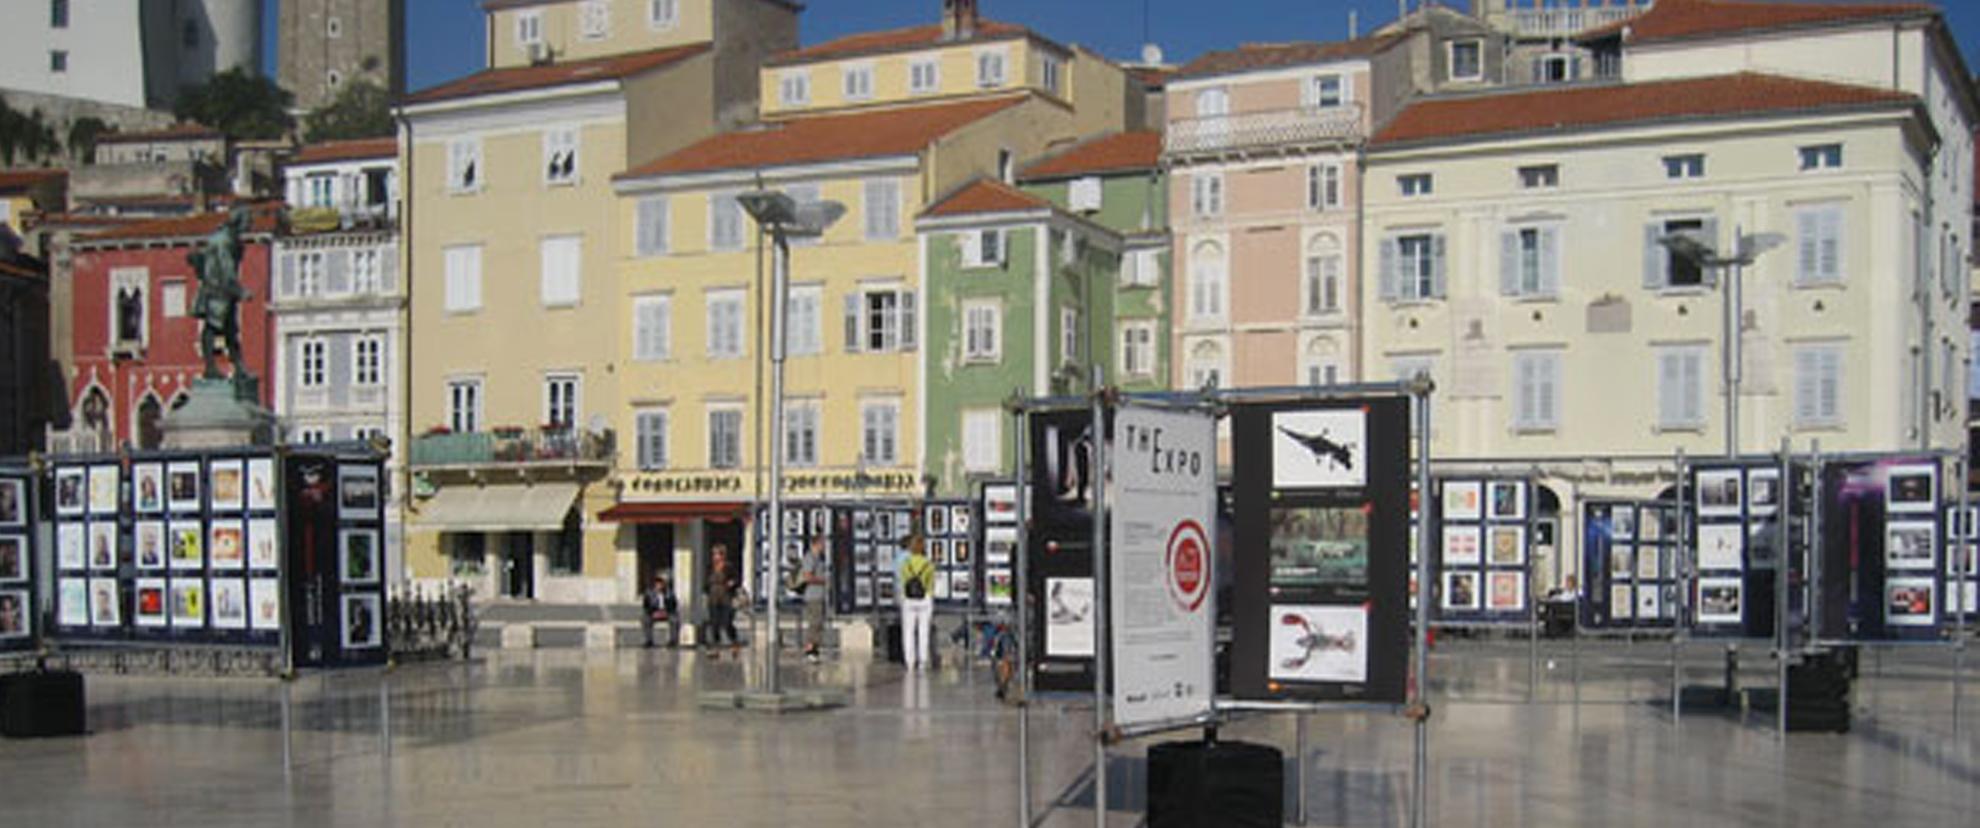 Tartini Plaza à Piran, Slovénie